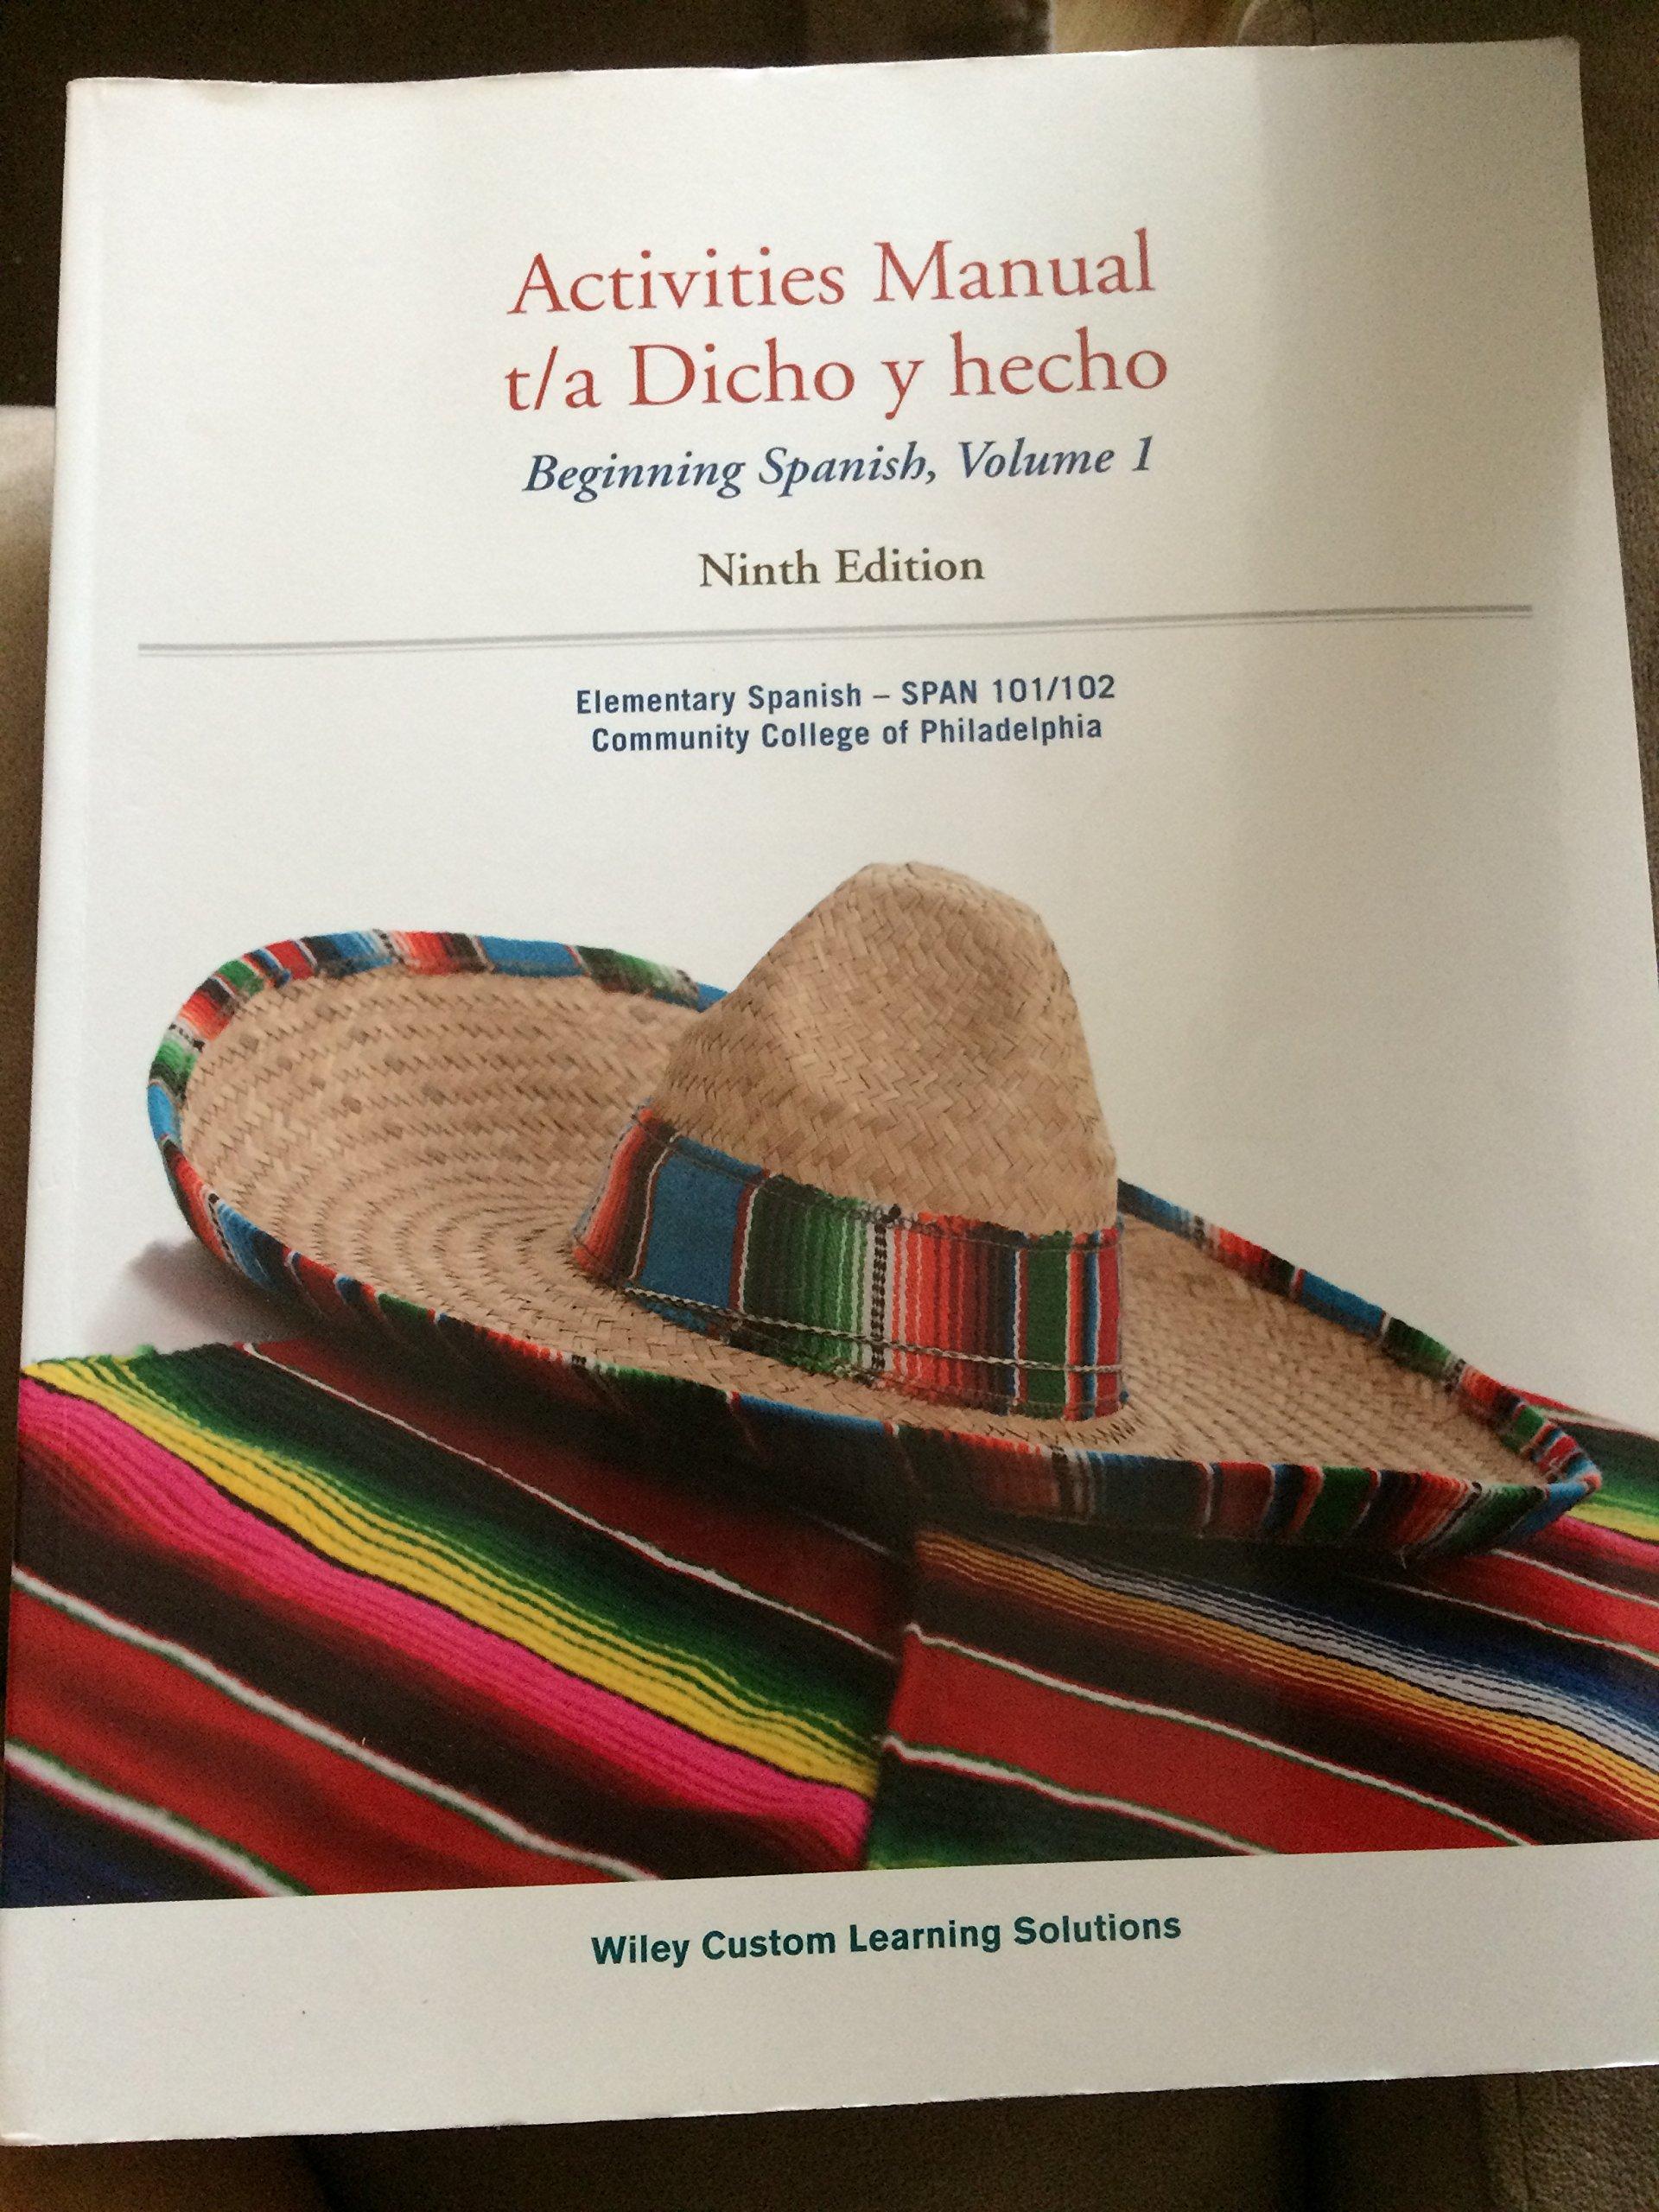 Activities Manual t/a Dicho y hecho Beginning Spanish, Volume 1 (Community  College of Philadelphia): 9781118791097: Amazon.com: Books